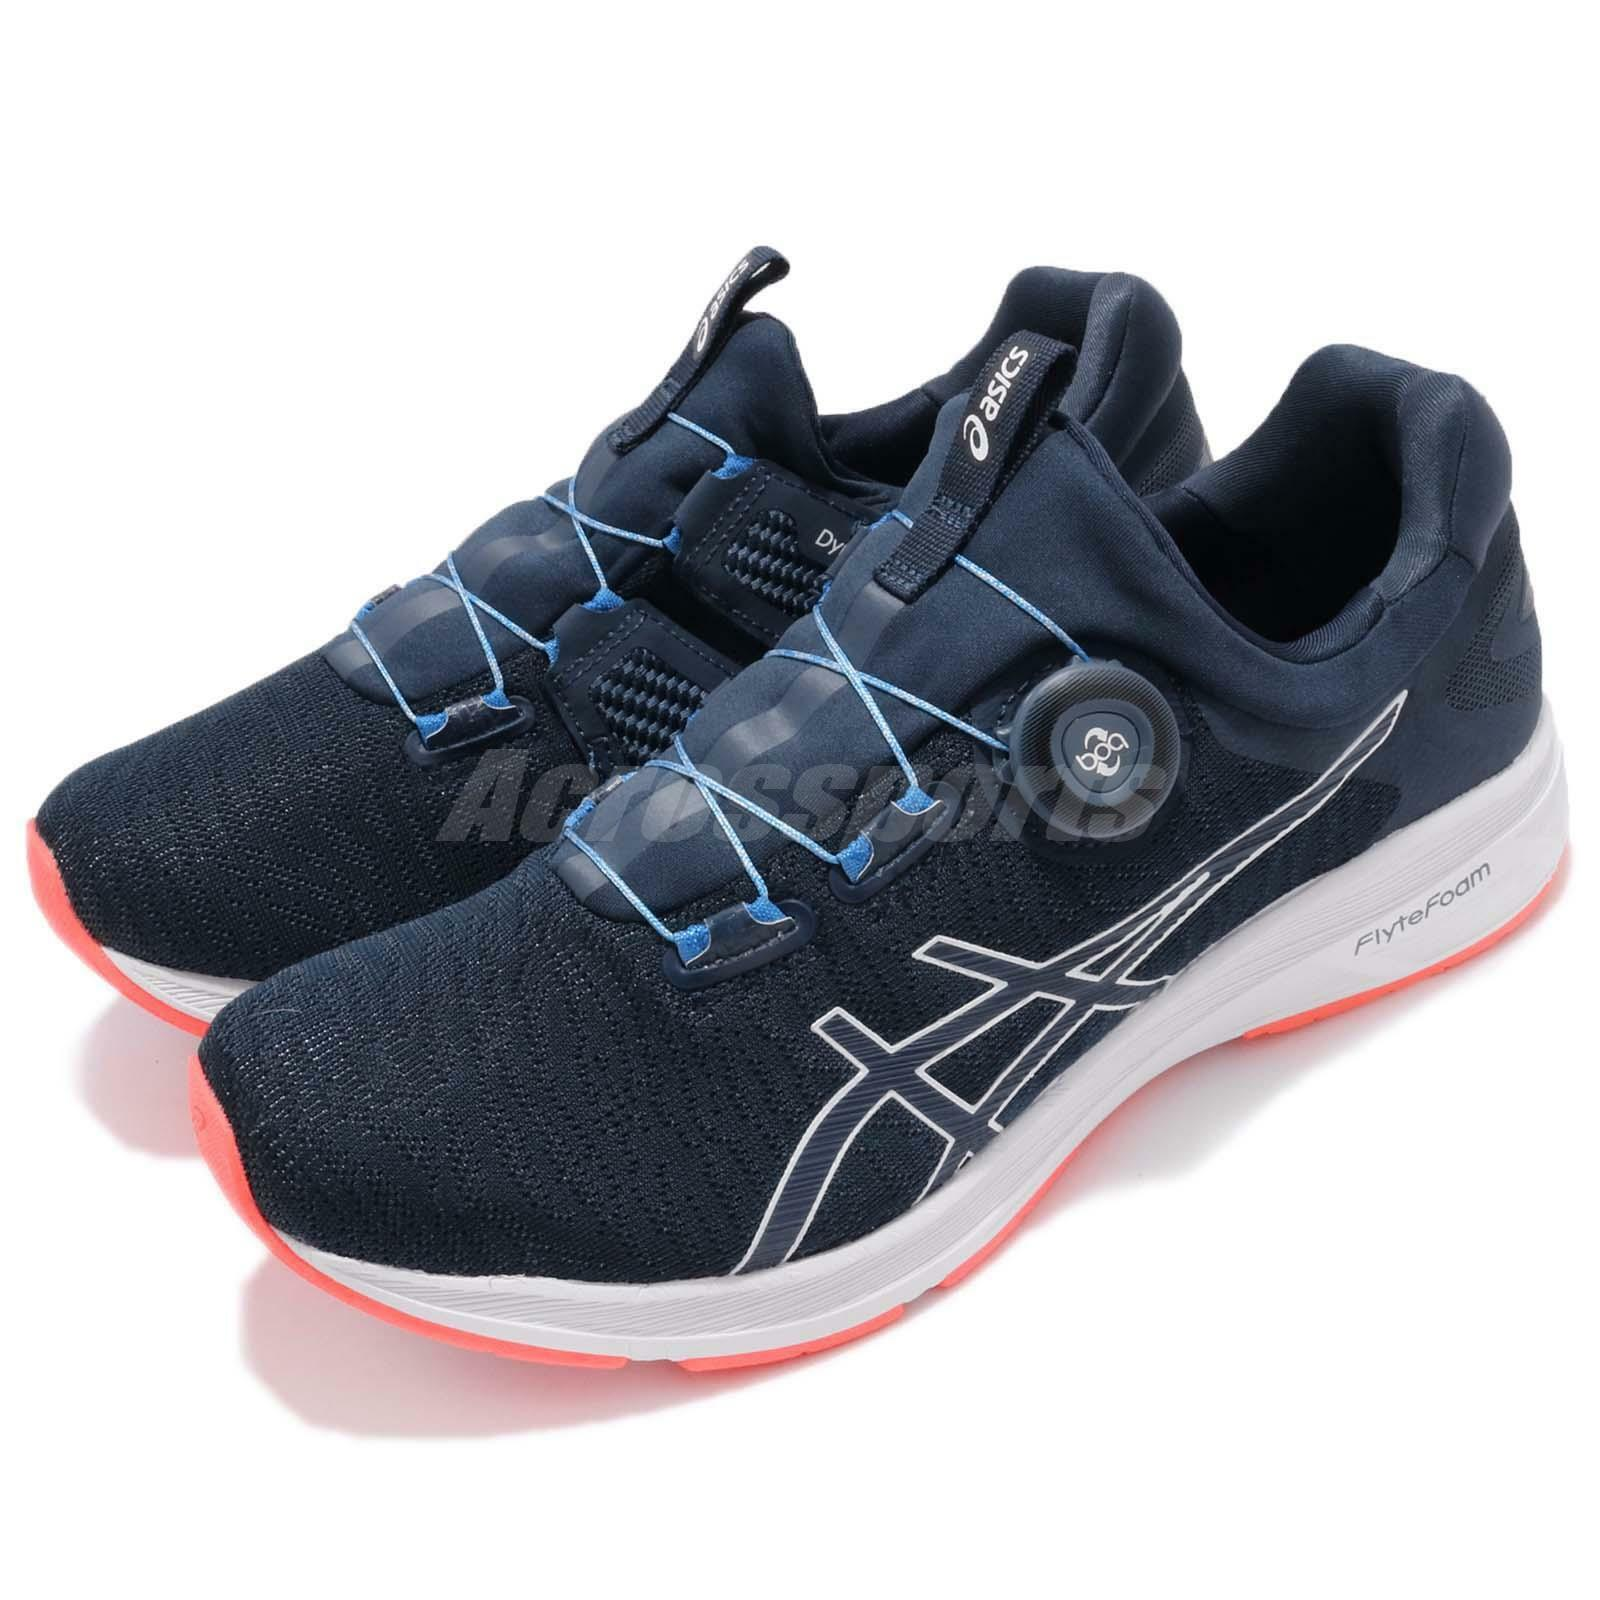 Asics Dynamis Boa Dark Laceless blueee White Navy Men Running shoes T7D1N-4901